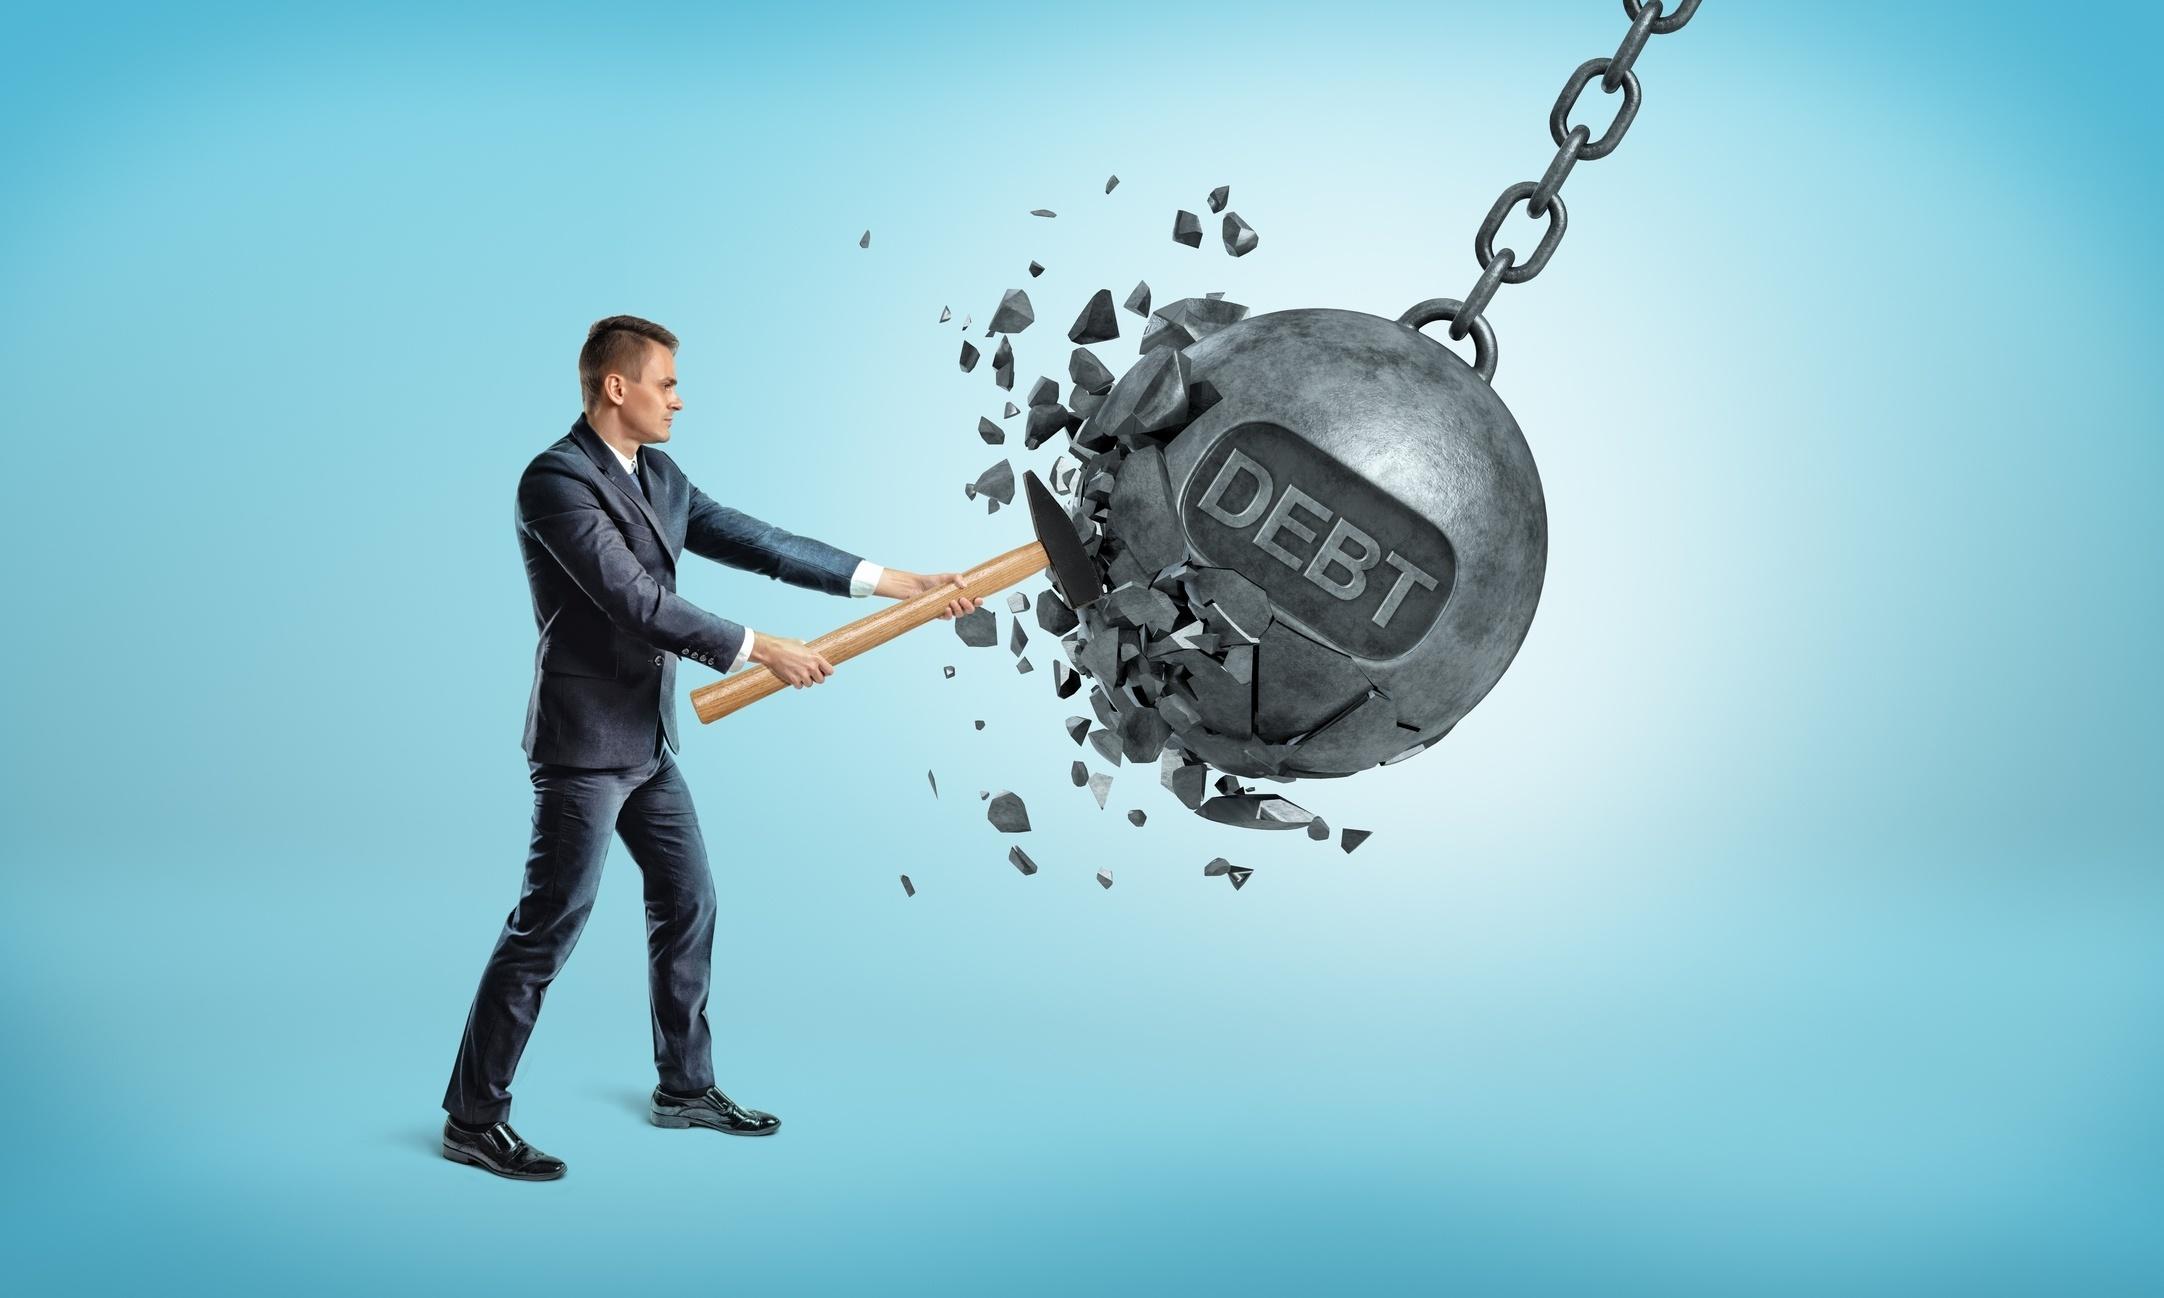 BAd Debt Loan loss iStock-834121956-201123-edited.jpg